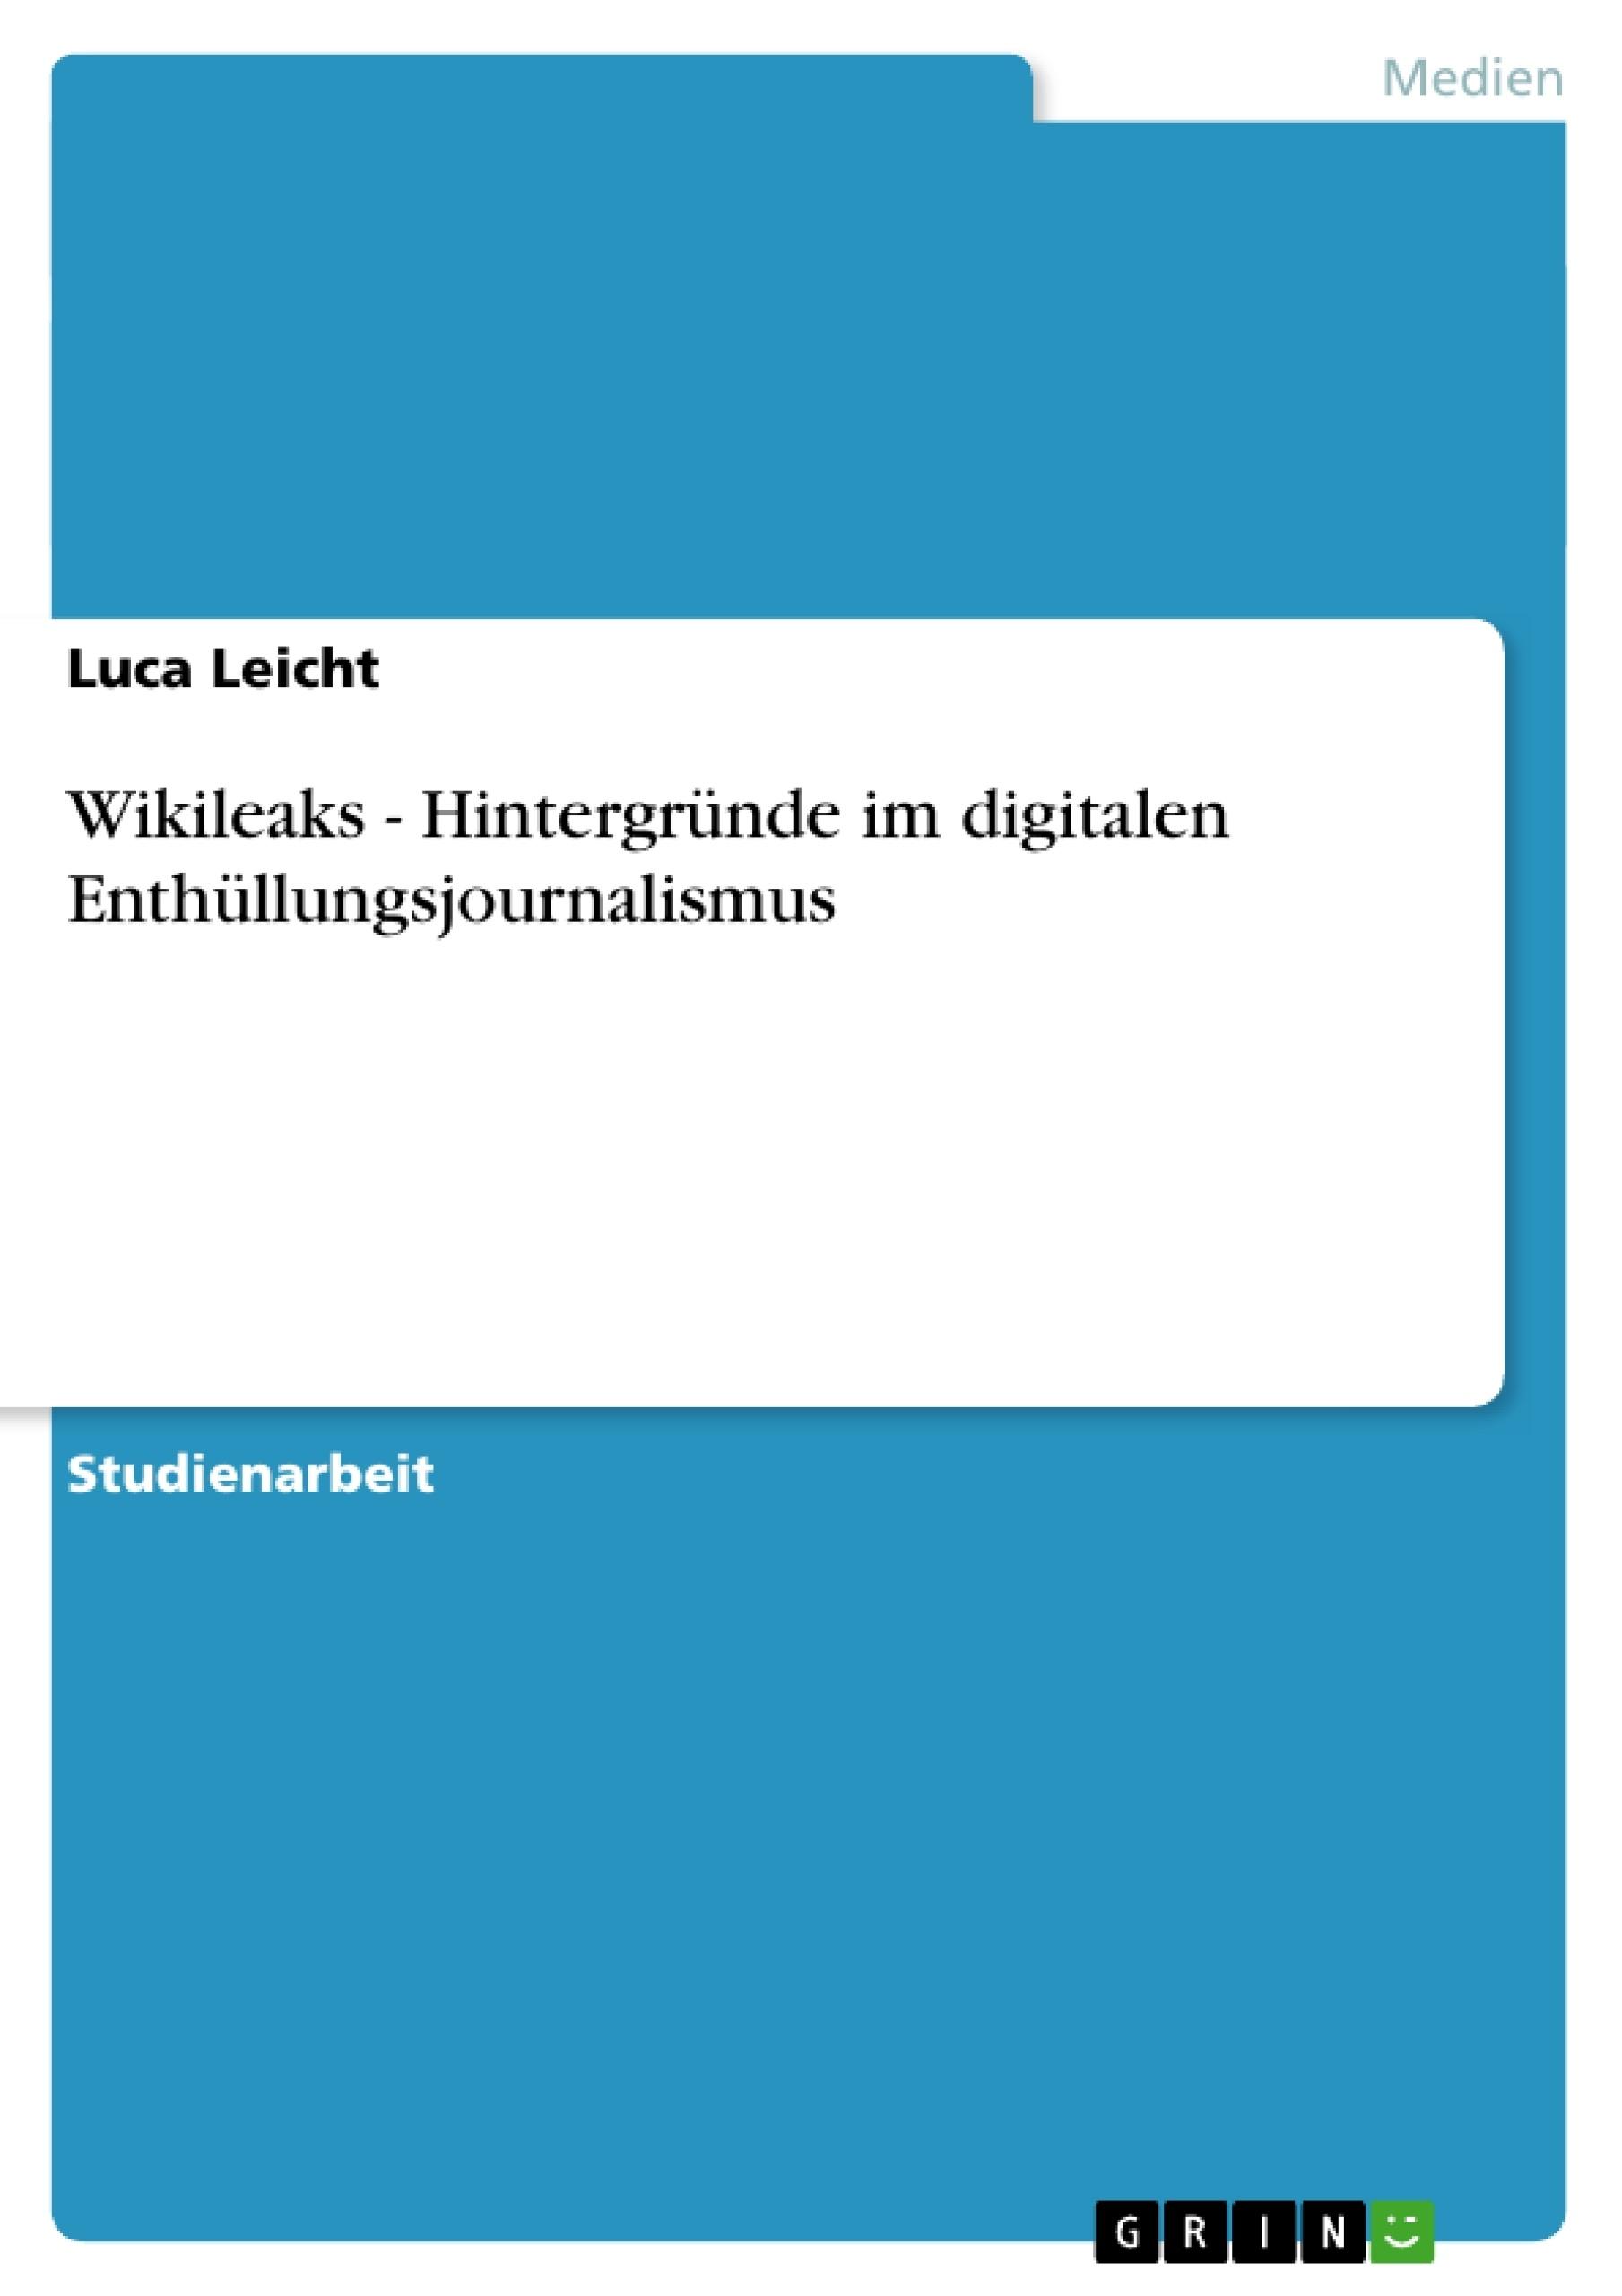 Titel: Wikileaks - Hintergründe im digitalen Enthüllungsjournalismus